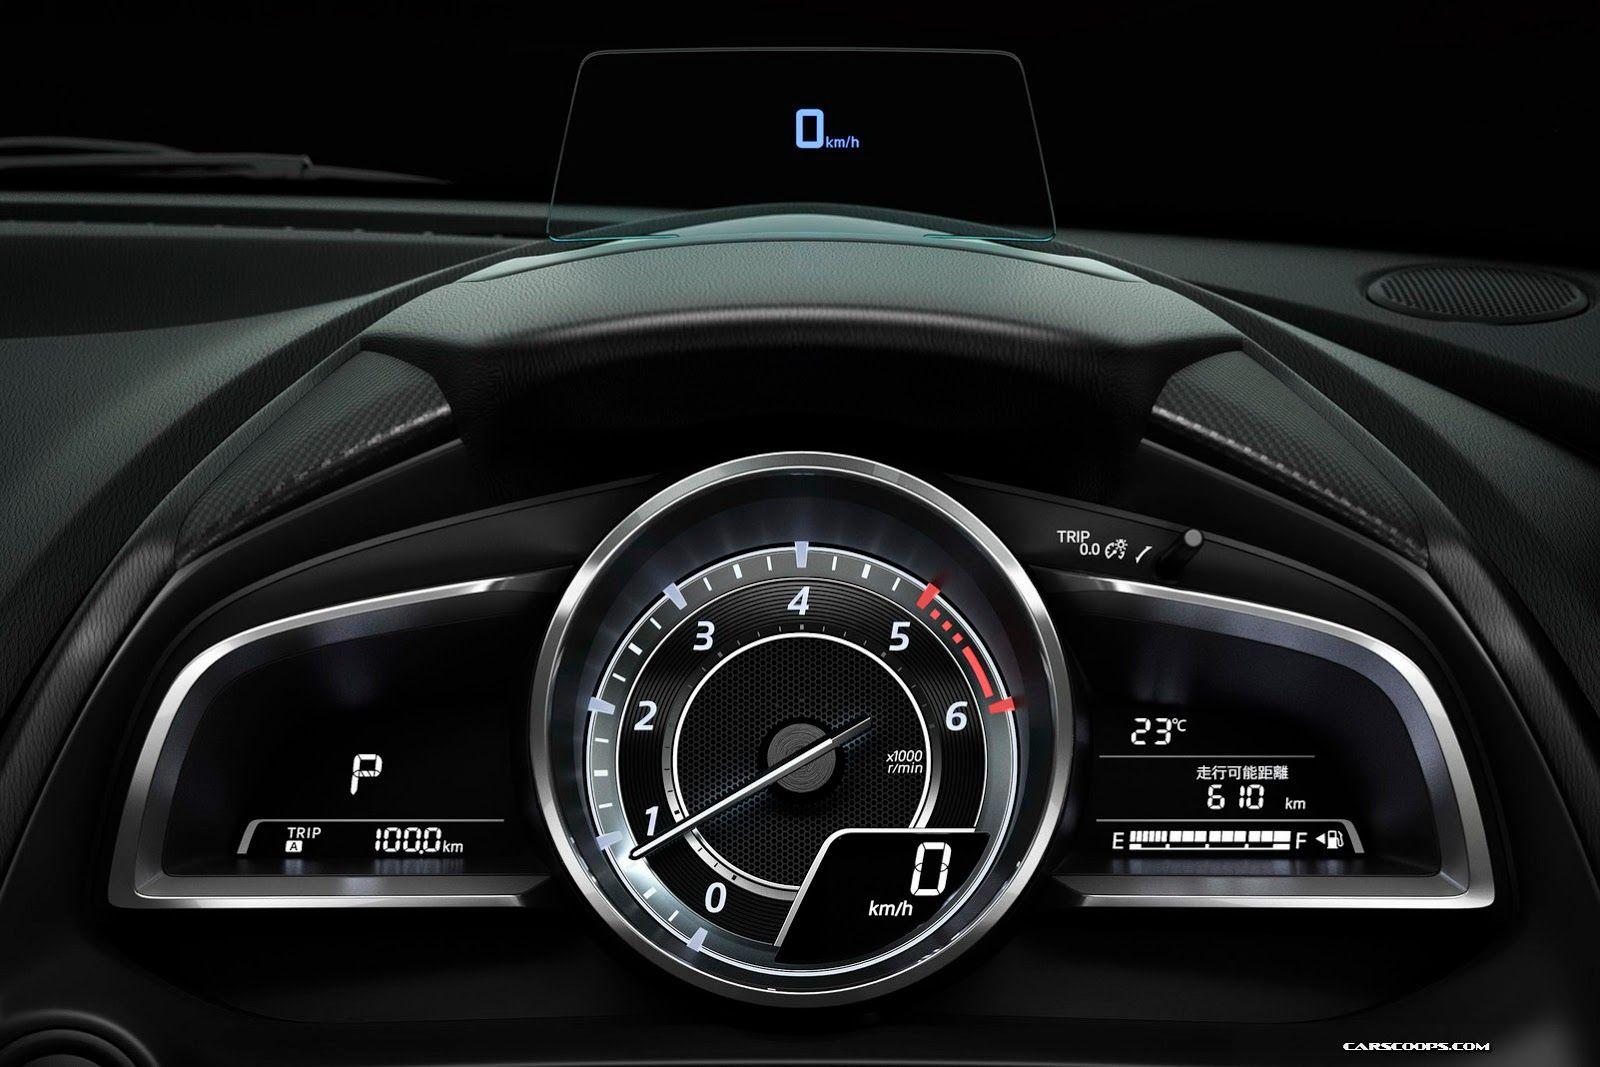 New 2015 Mazda2 Officially Breaks Cover 75 Photos Videos Carscoops Mazda Mazda 2 Vehicle Gauge